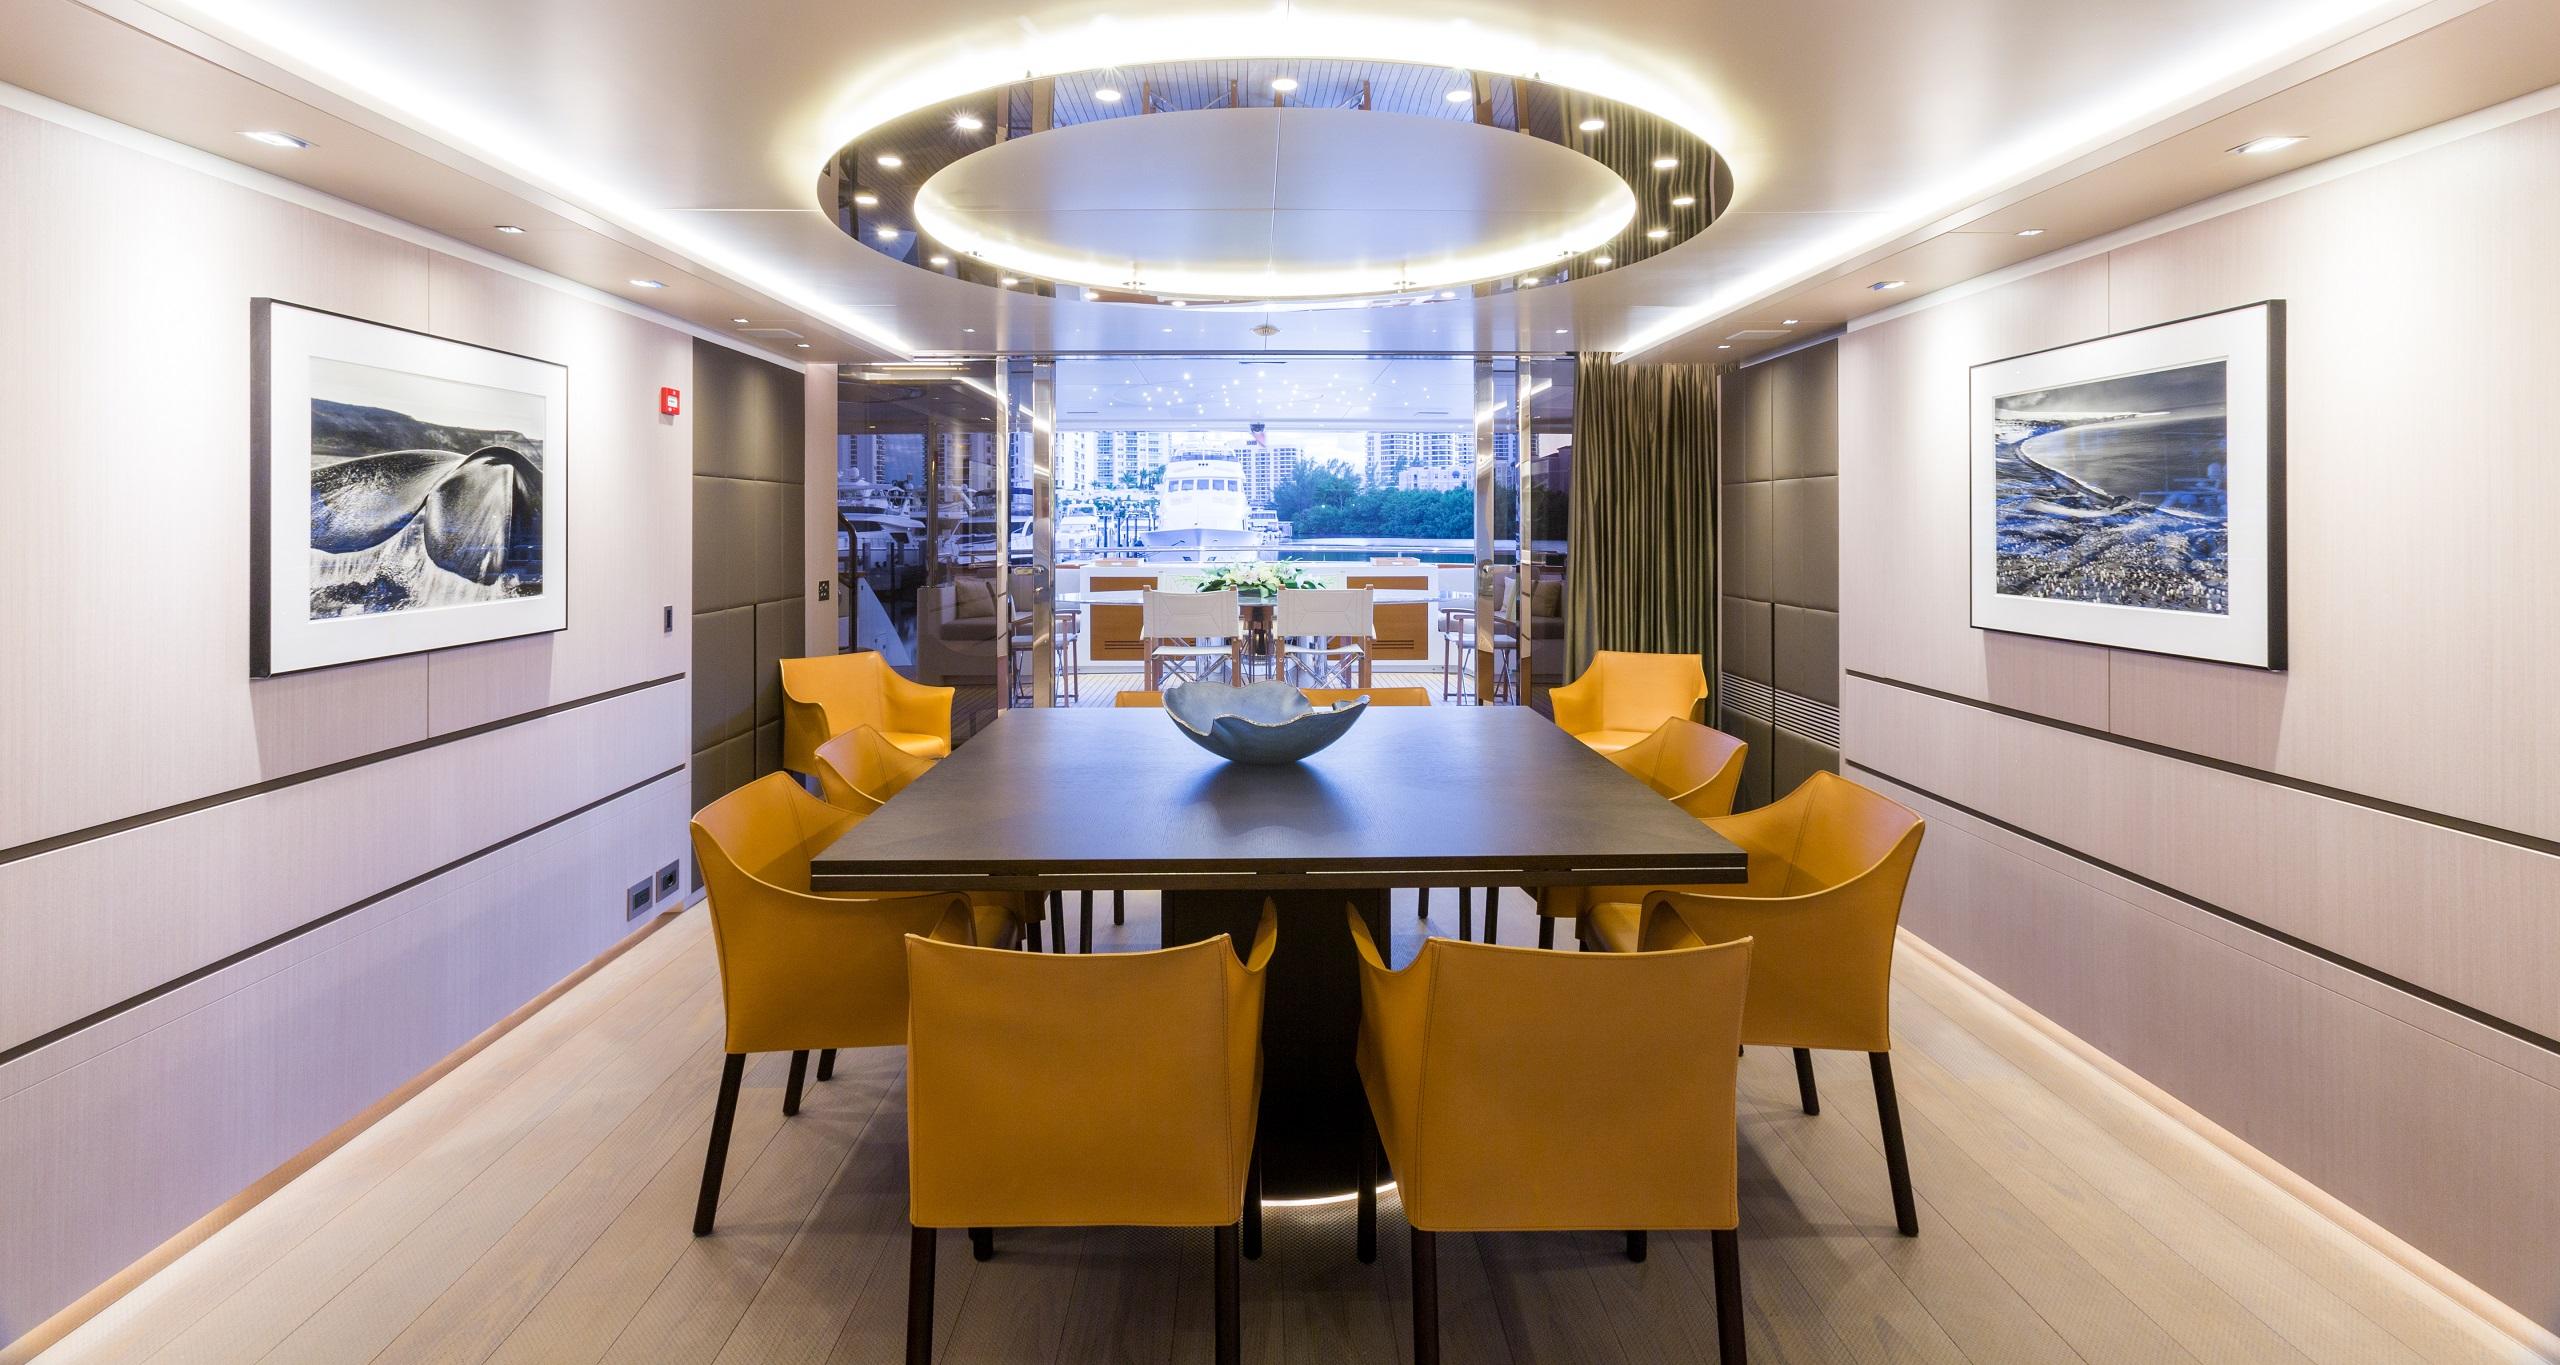 Benetti Crystal MrD_interiors credit Quin Bisset